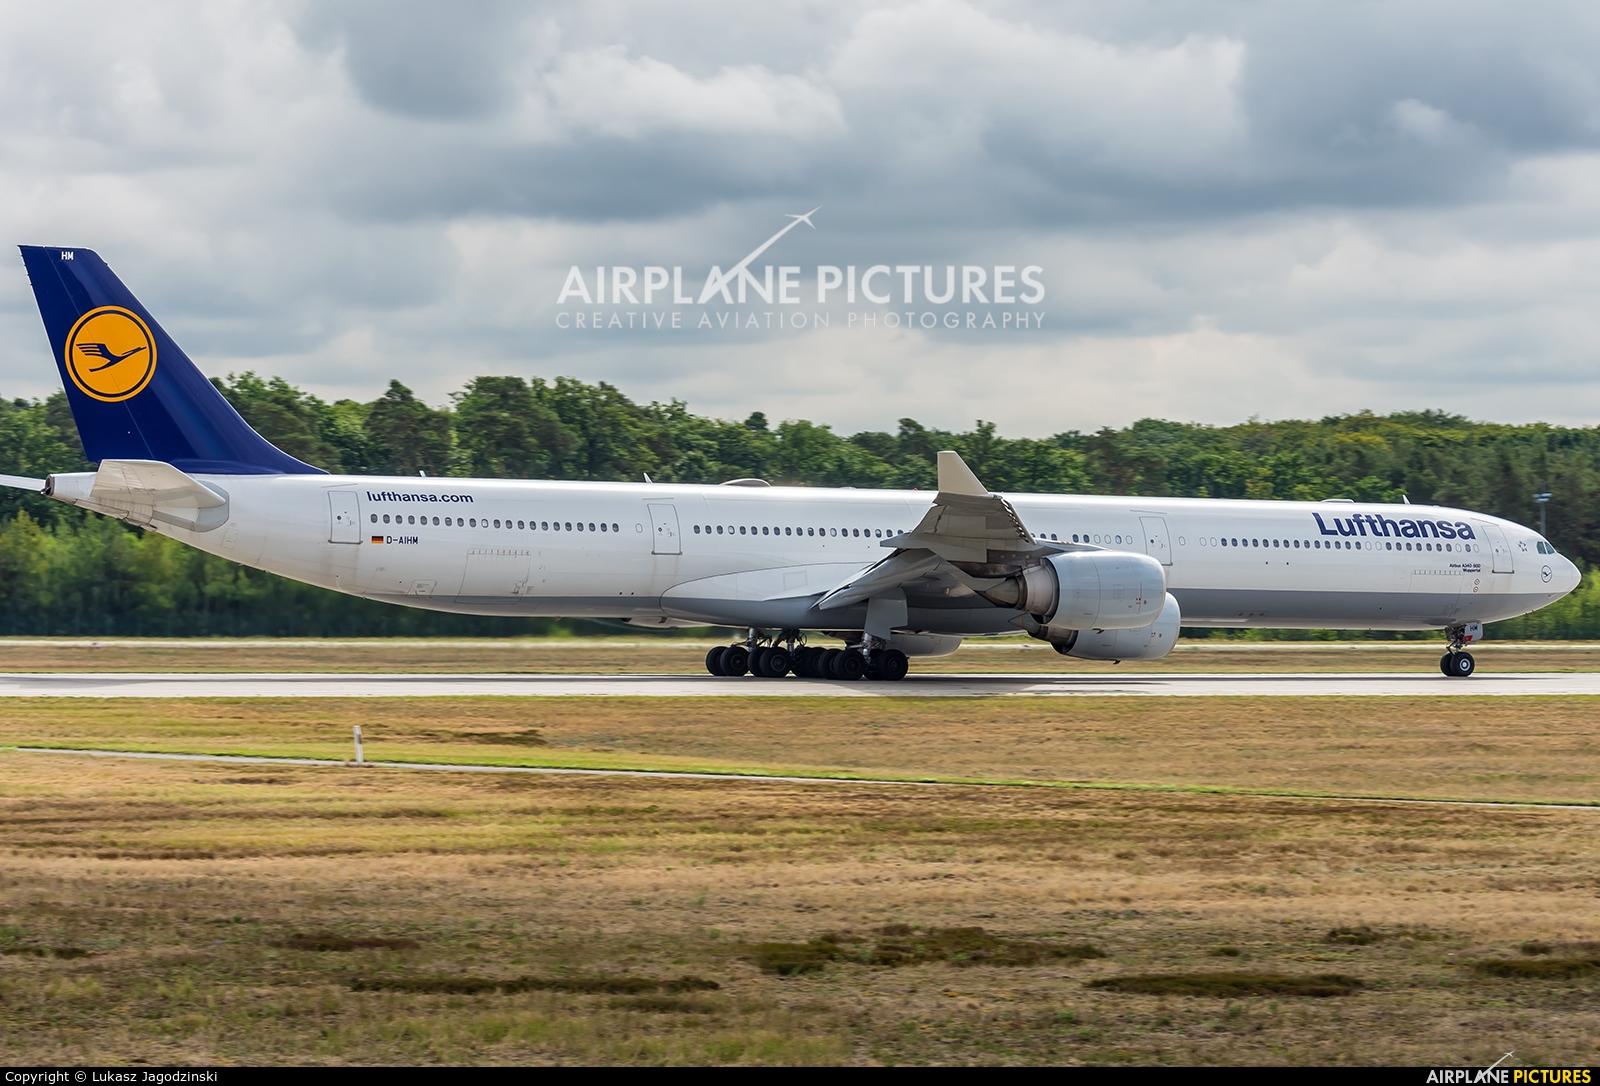 Lufthansa D-AIHM aircraft at Frankfurt